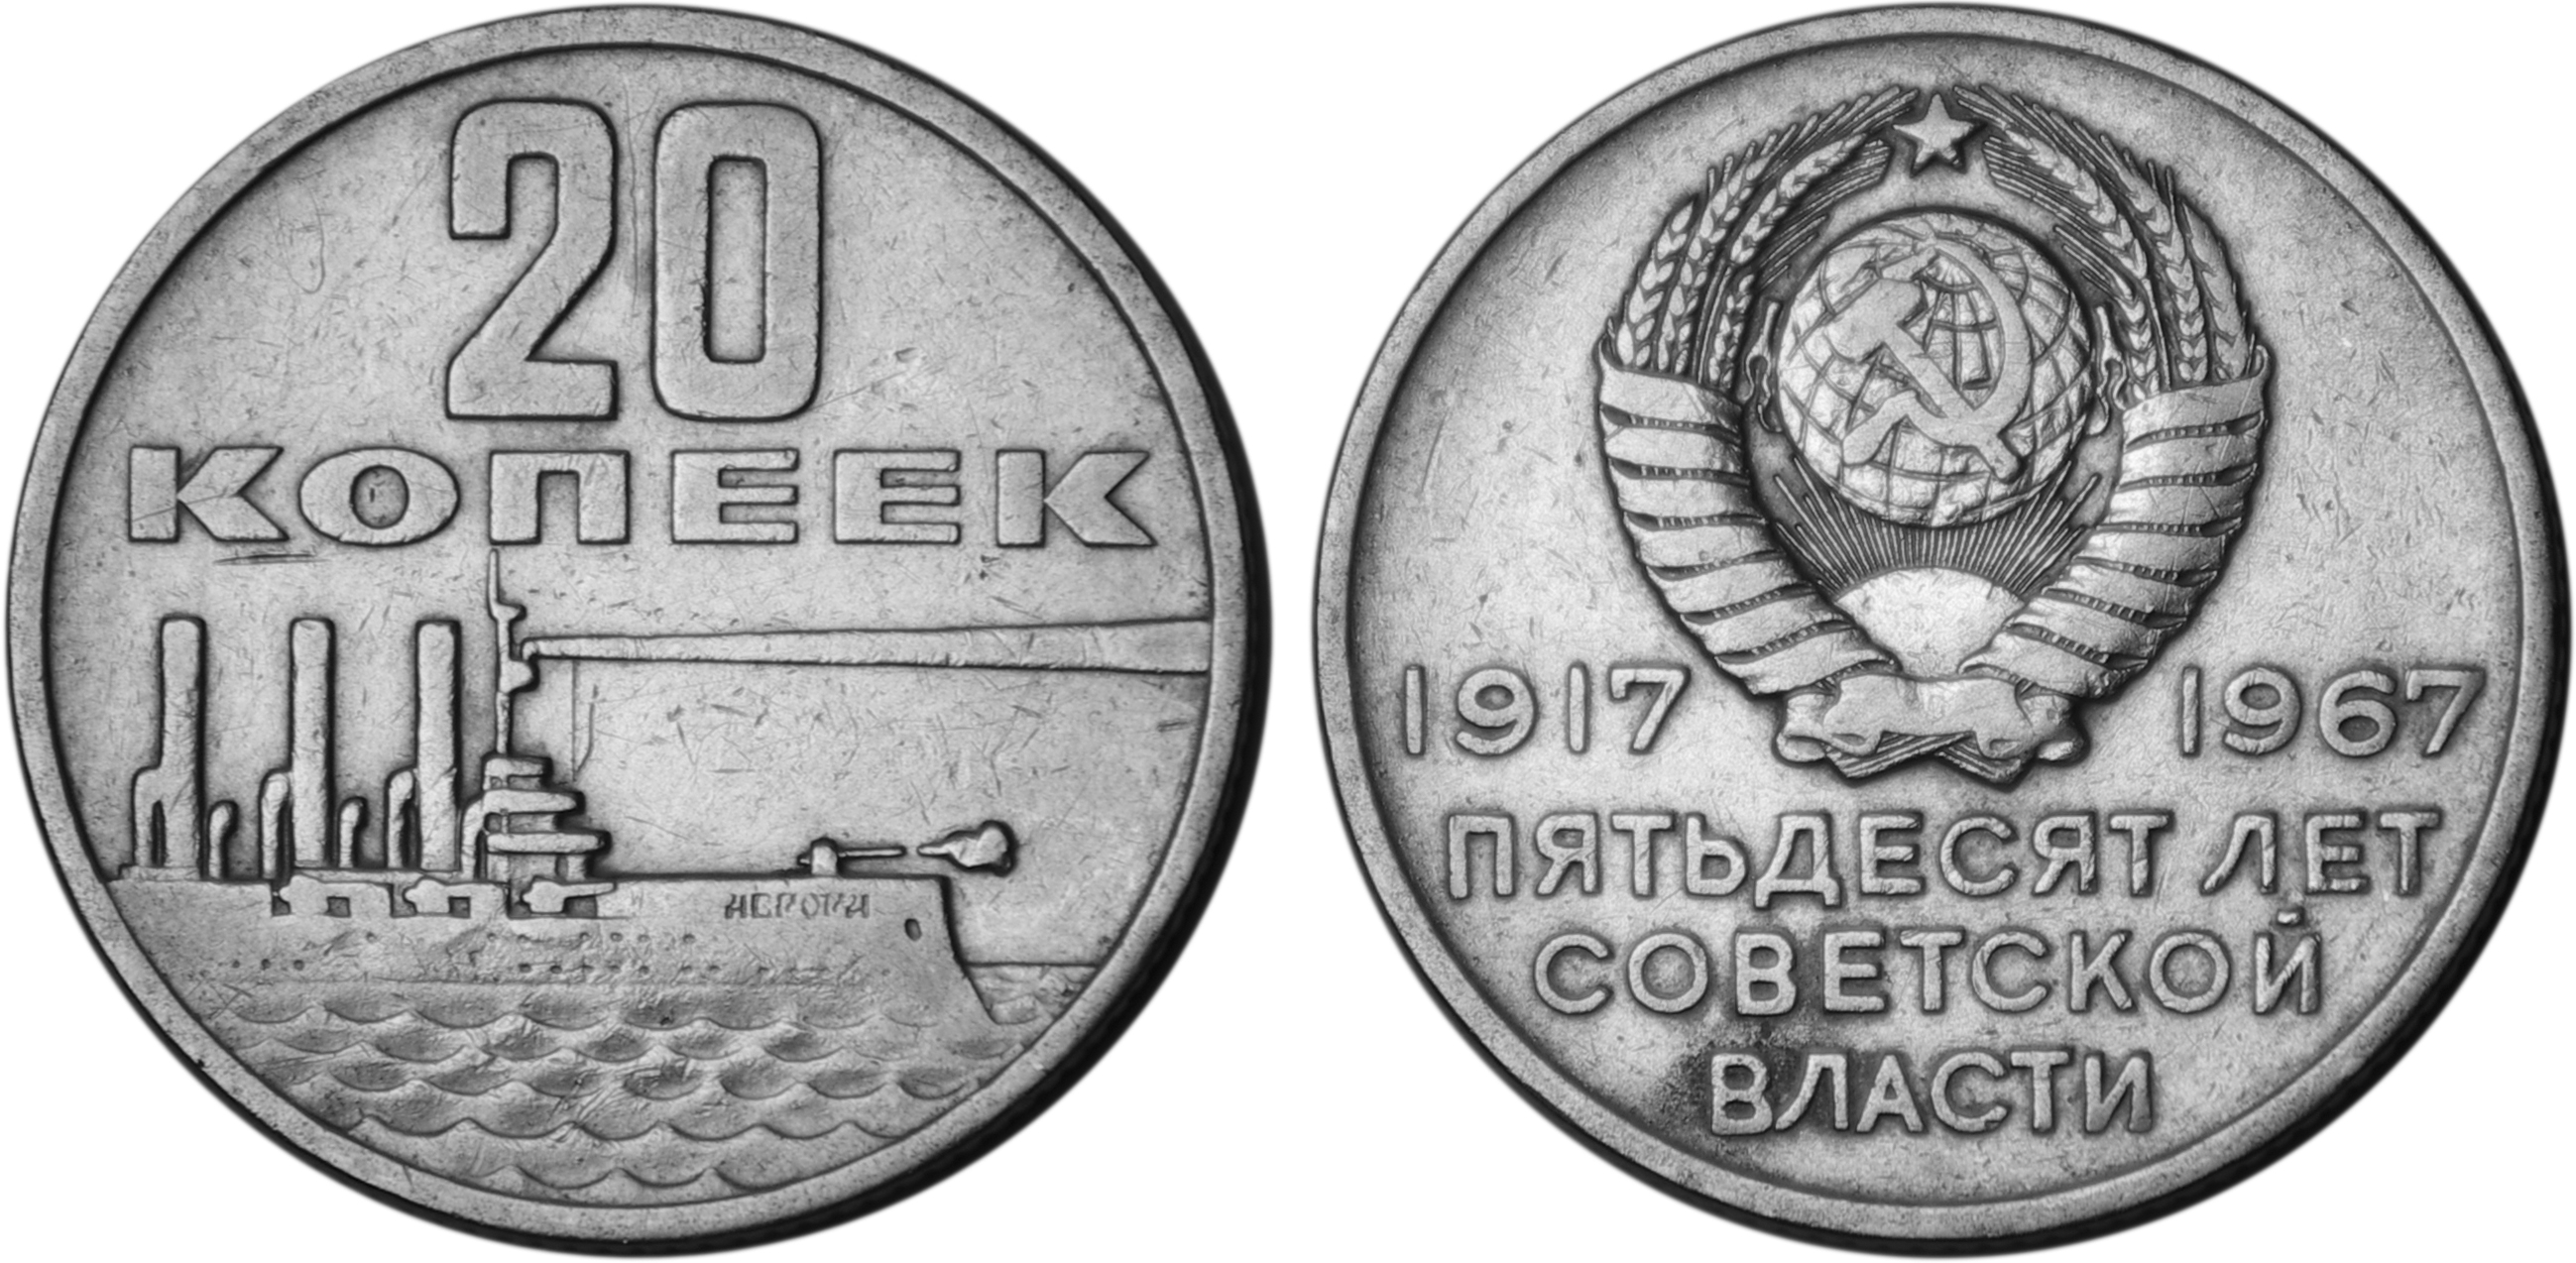 Soviet_Union-1967-Coin-0.20._50_Years_of_Soviet_Power.jpg